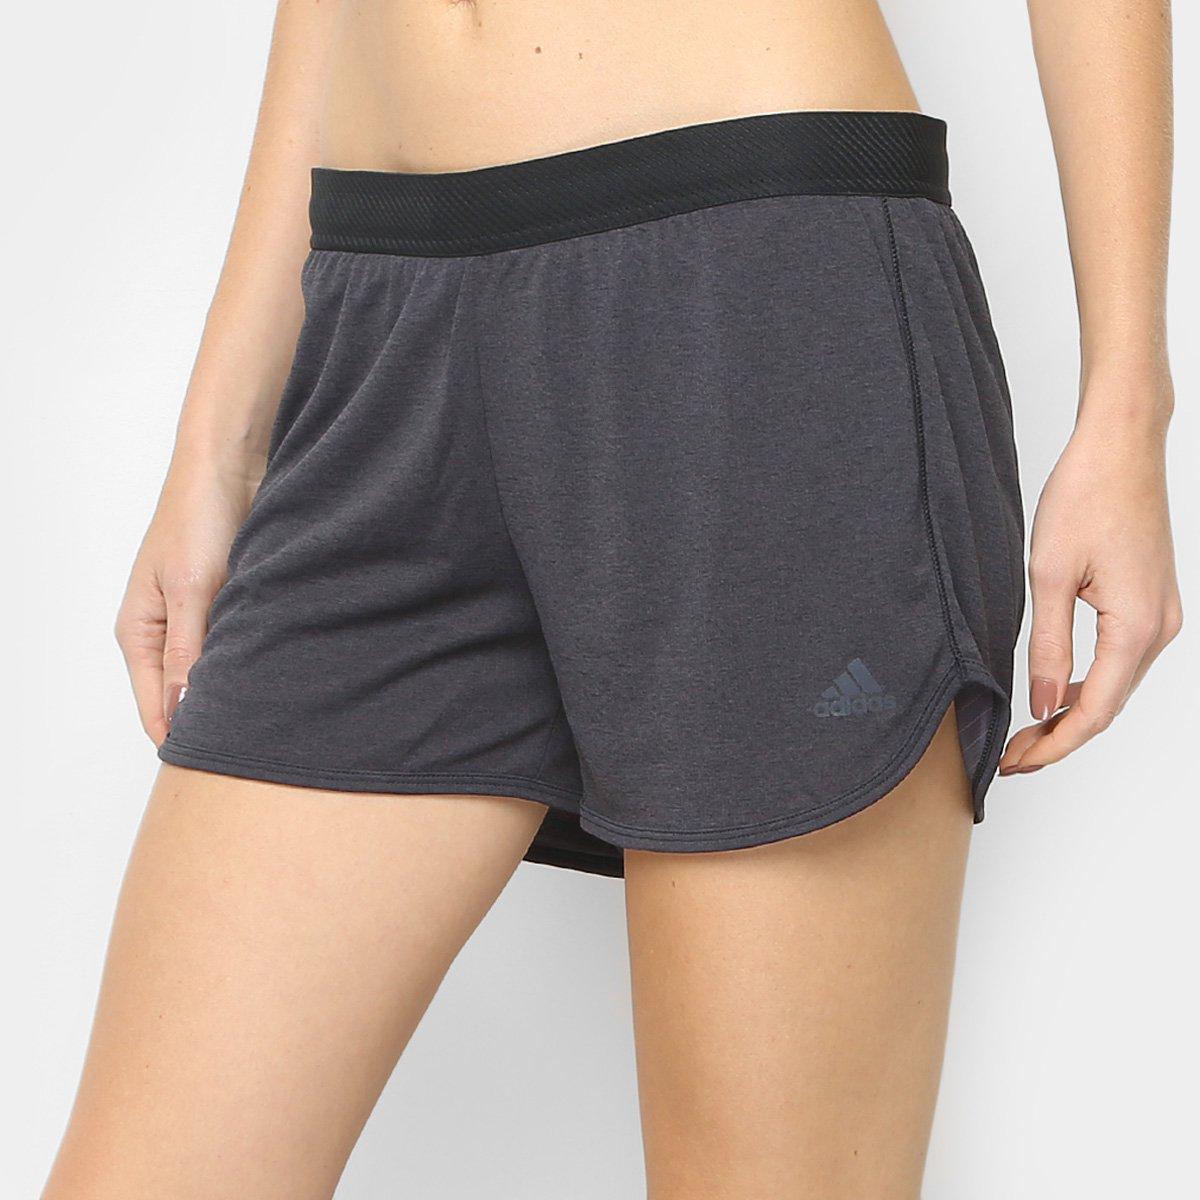 301a6f7c3 Short Adidas Corechill Climachill Feminino